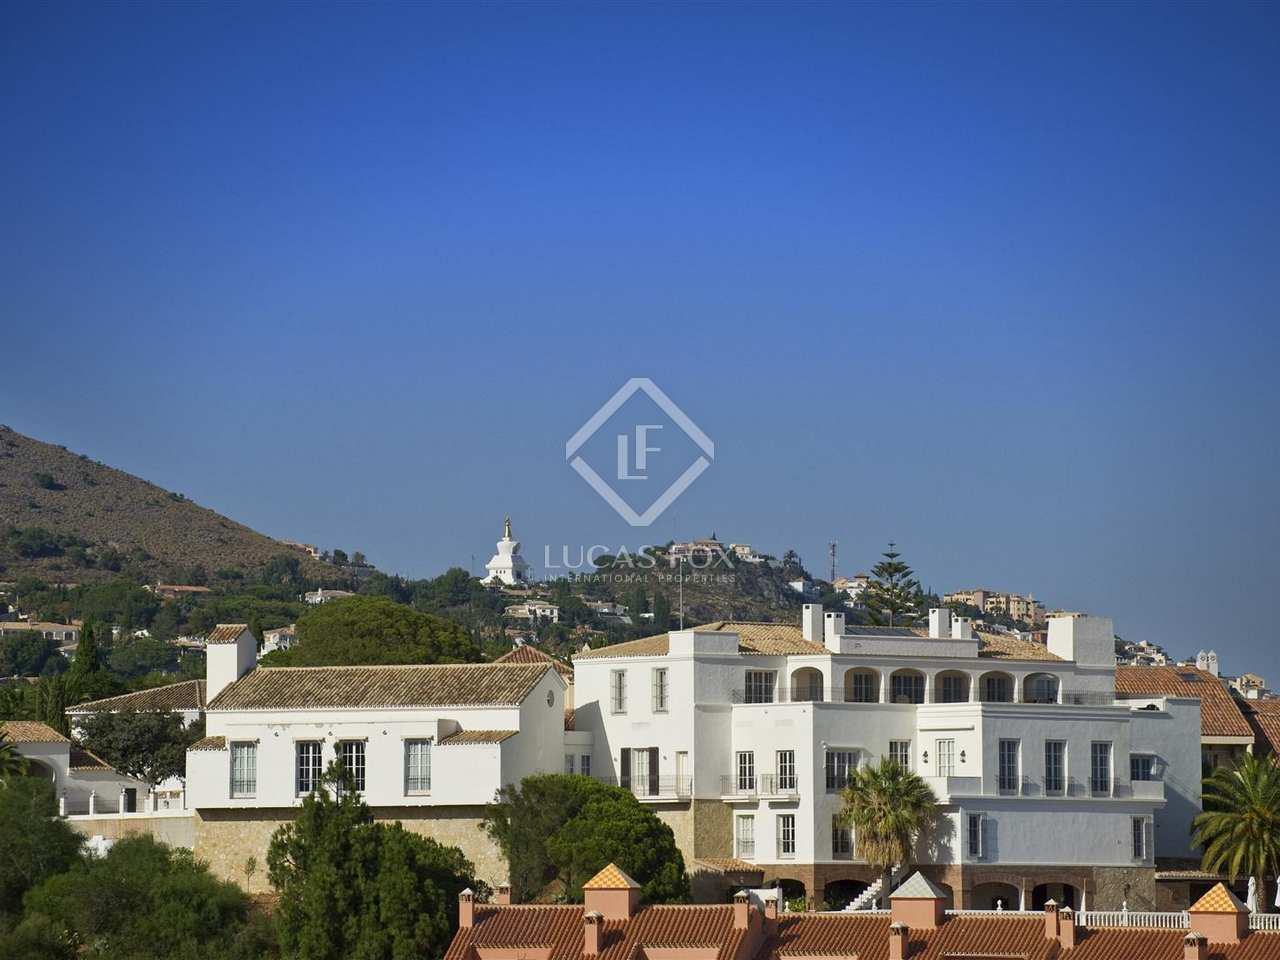 1 618m haus villa zum verkauf in malaga andalusien. Black Bedroom Furniture Sets. Home Design Ideas